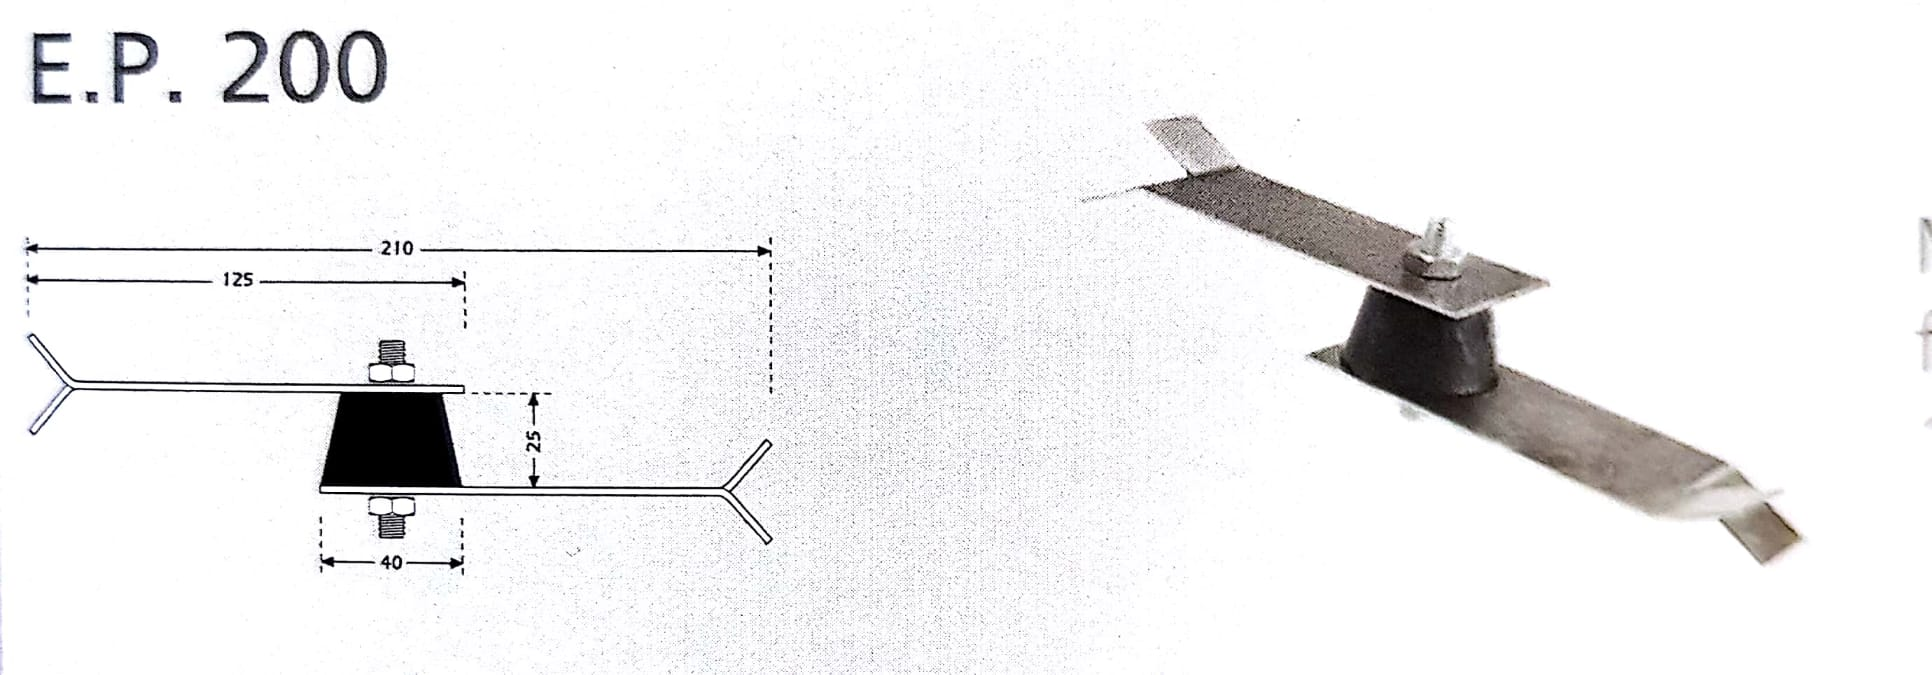 Custom EP200 wall vibration isolation mount